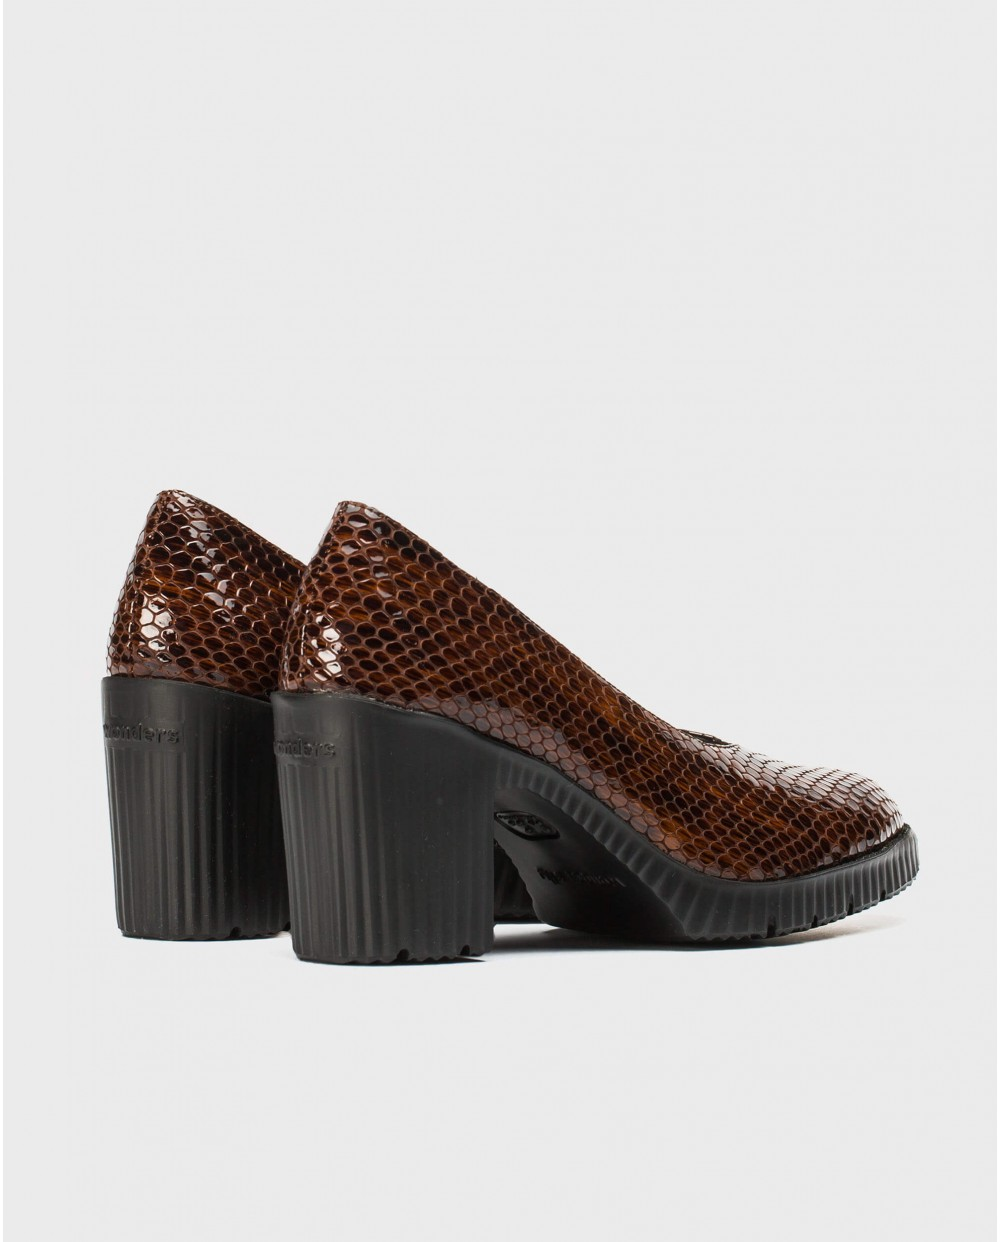 Wonders-Heels-High heeled shoe with throat